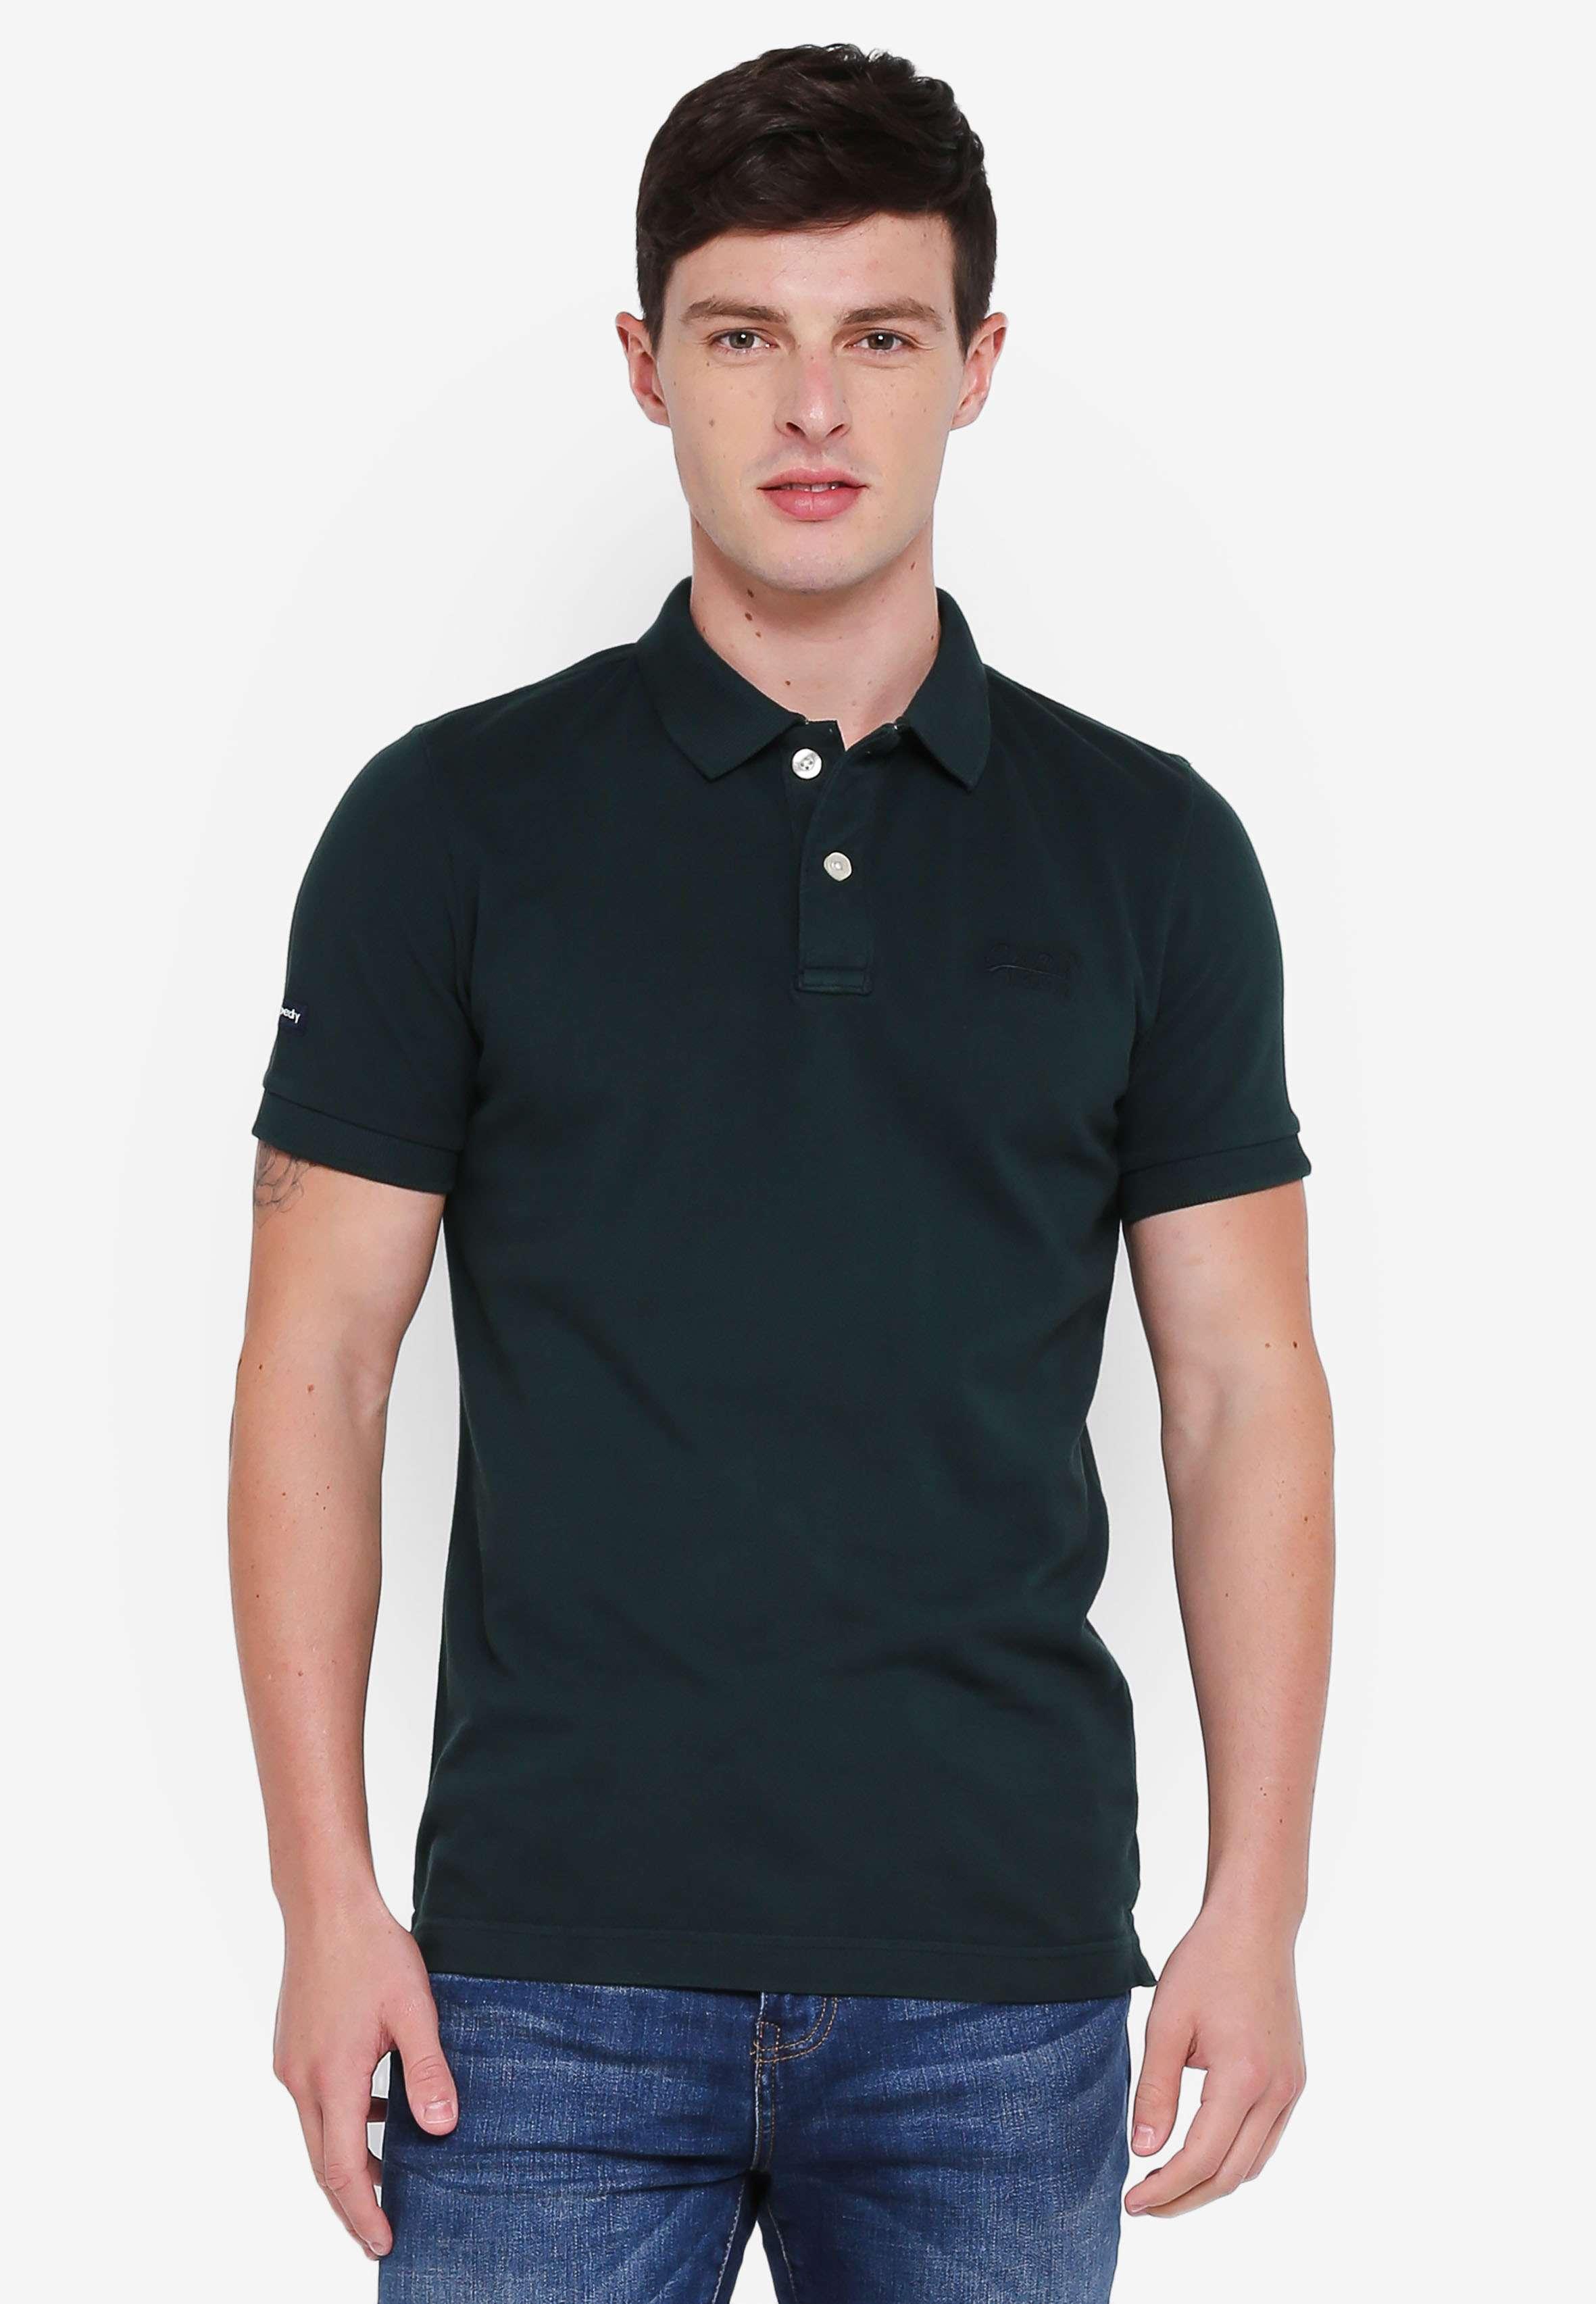 Vintage Destroy Short Sleeve Pique Polo Shirt